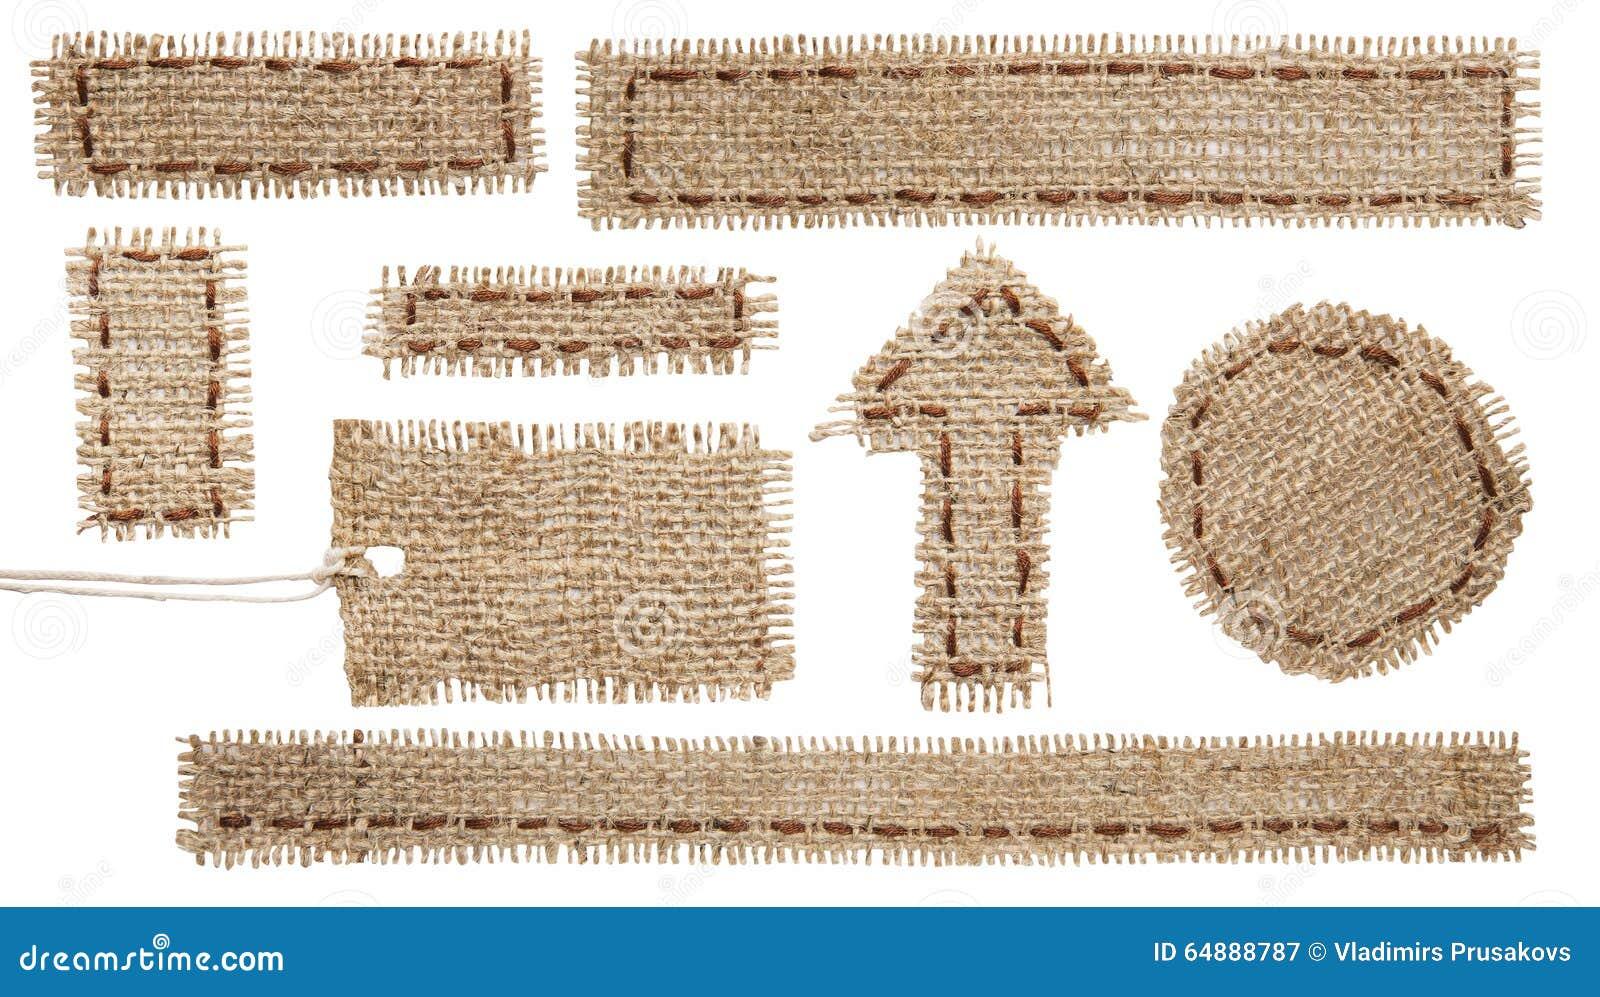 Leinwand-Gewebe-Tag-Aufkleber, Stoff-Flecken-Band des groben Sackzeugs, Sackleinen